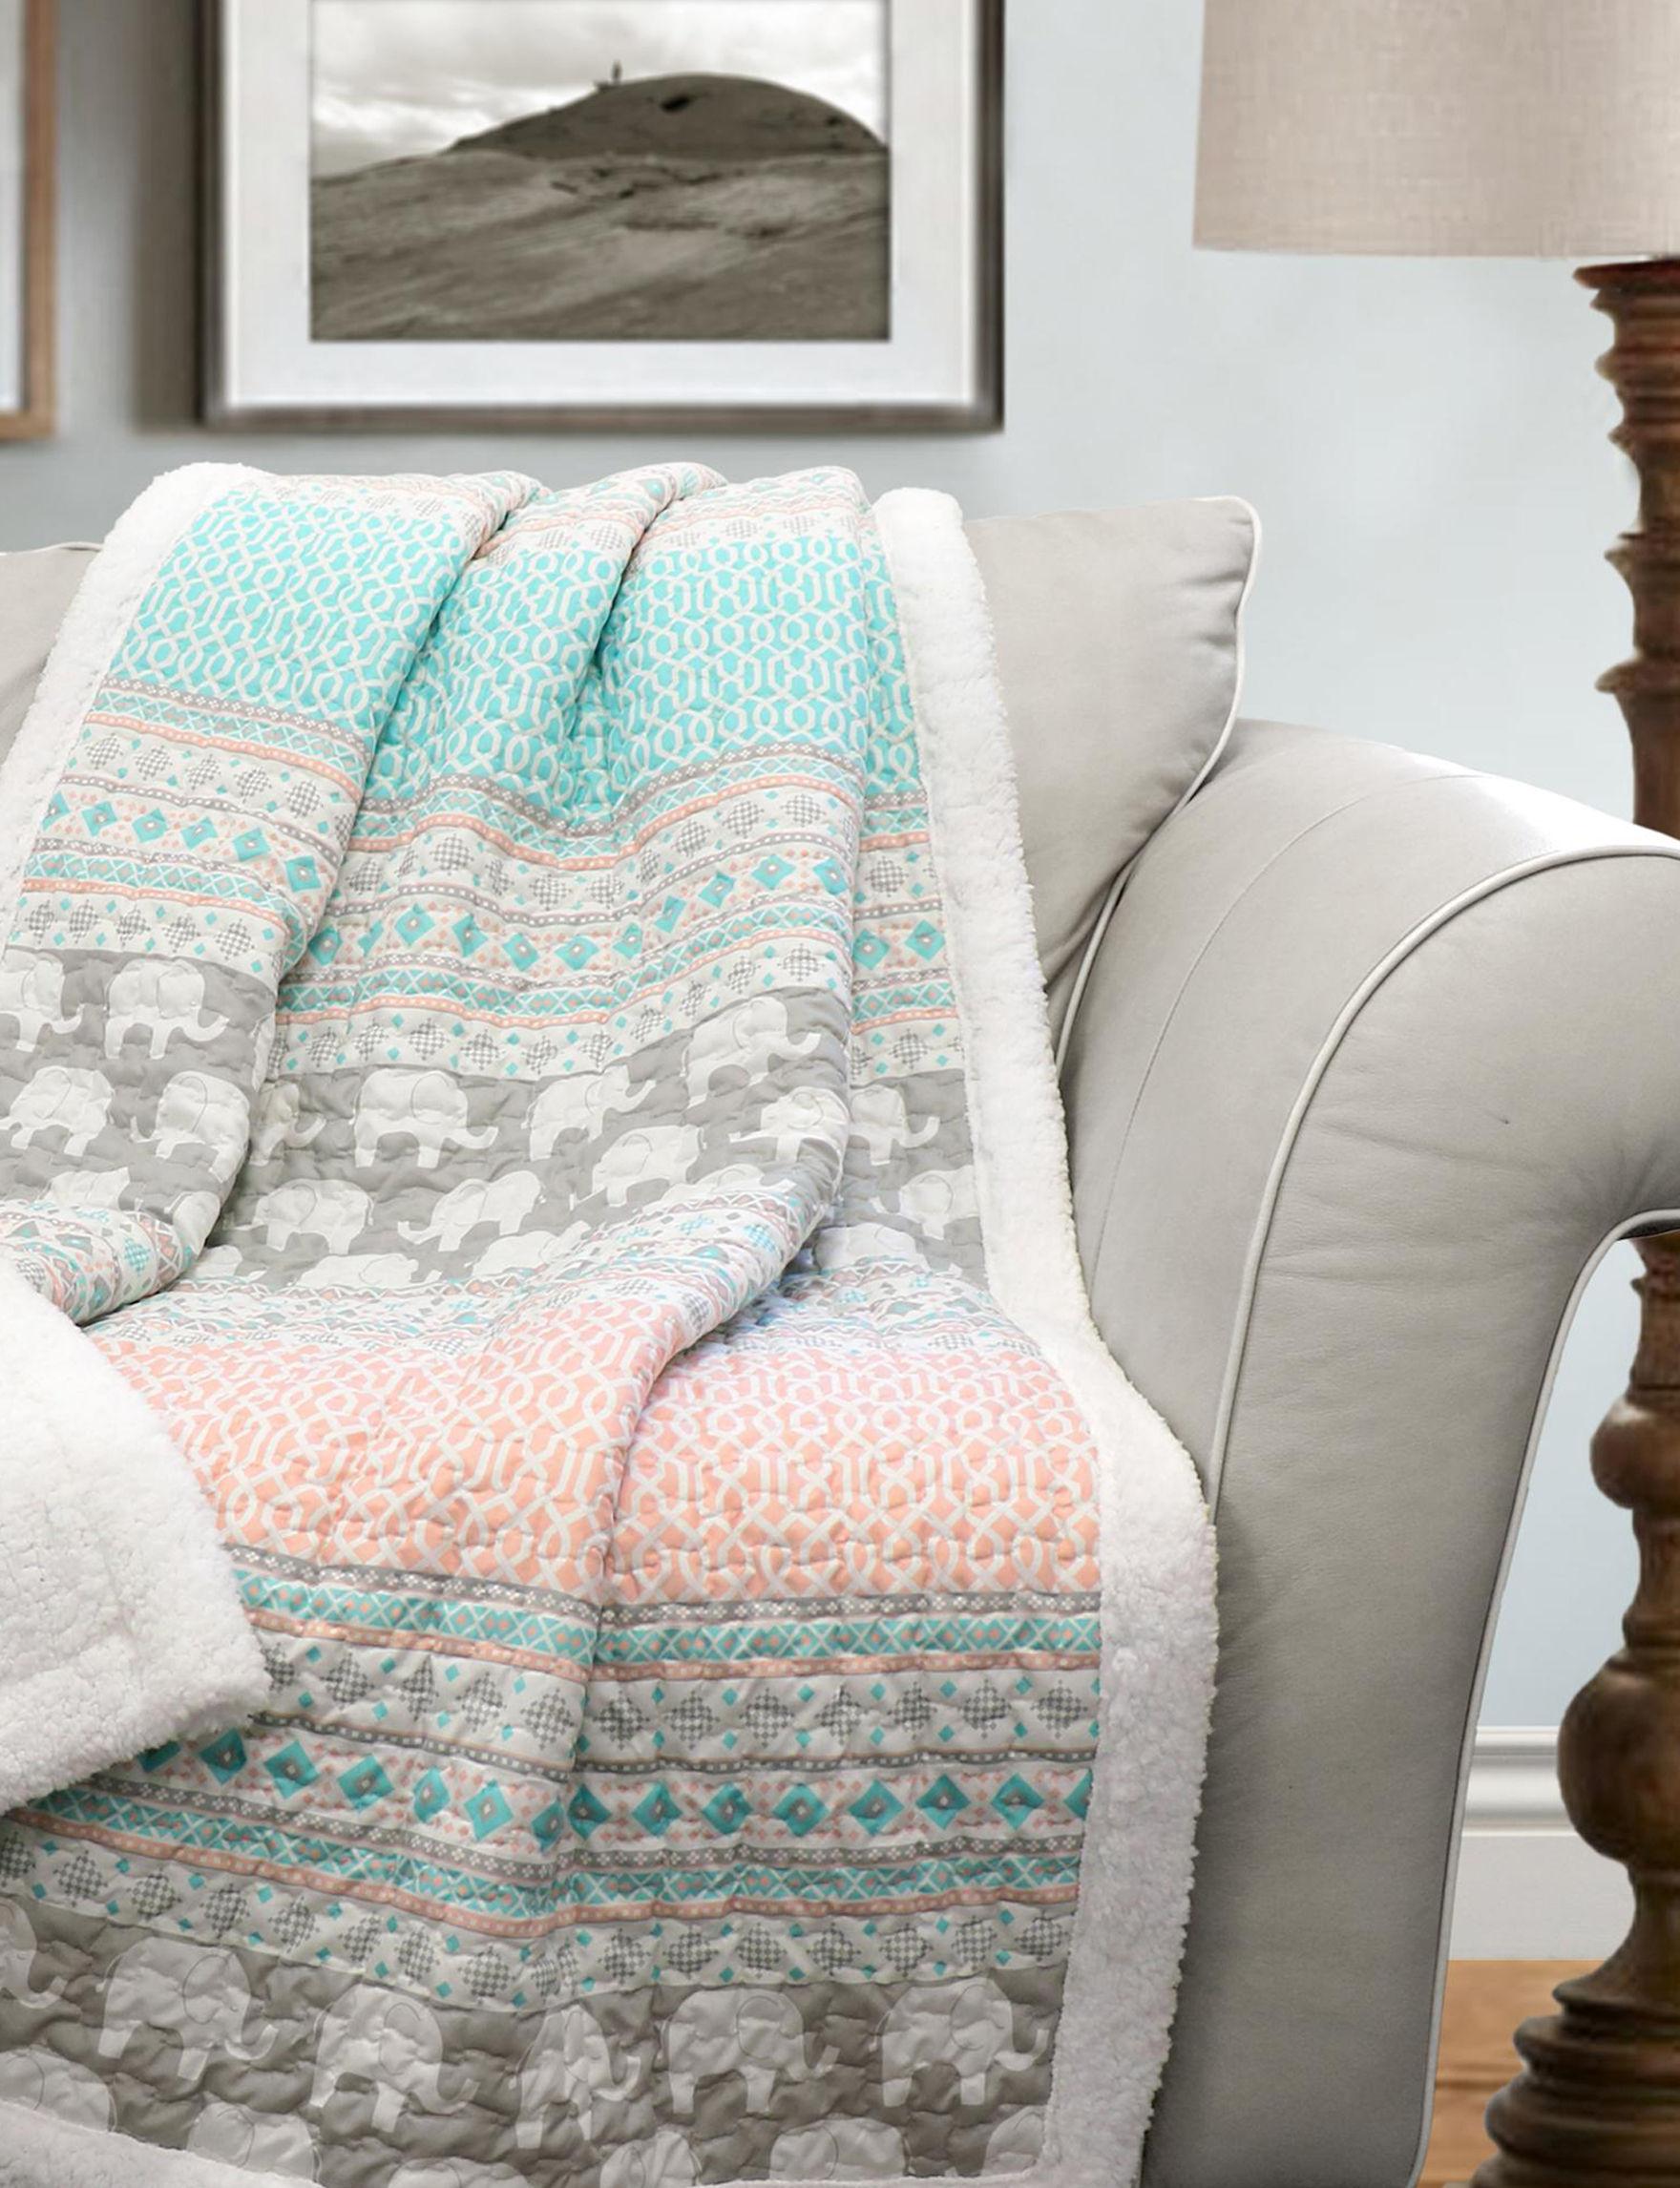 Lush Decor Pink / Blue Blankets & Throws